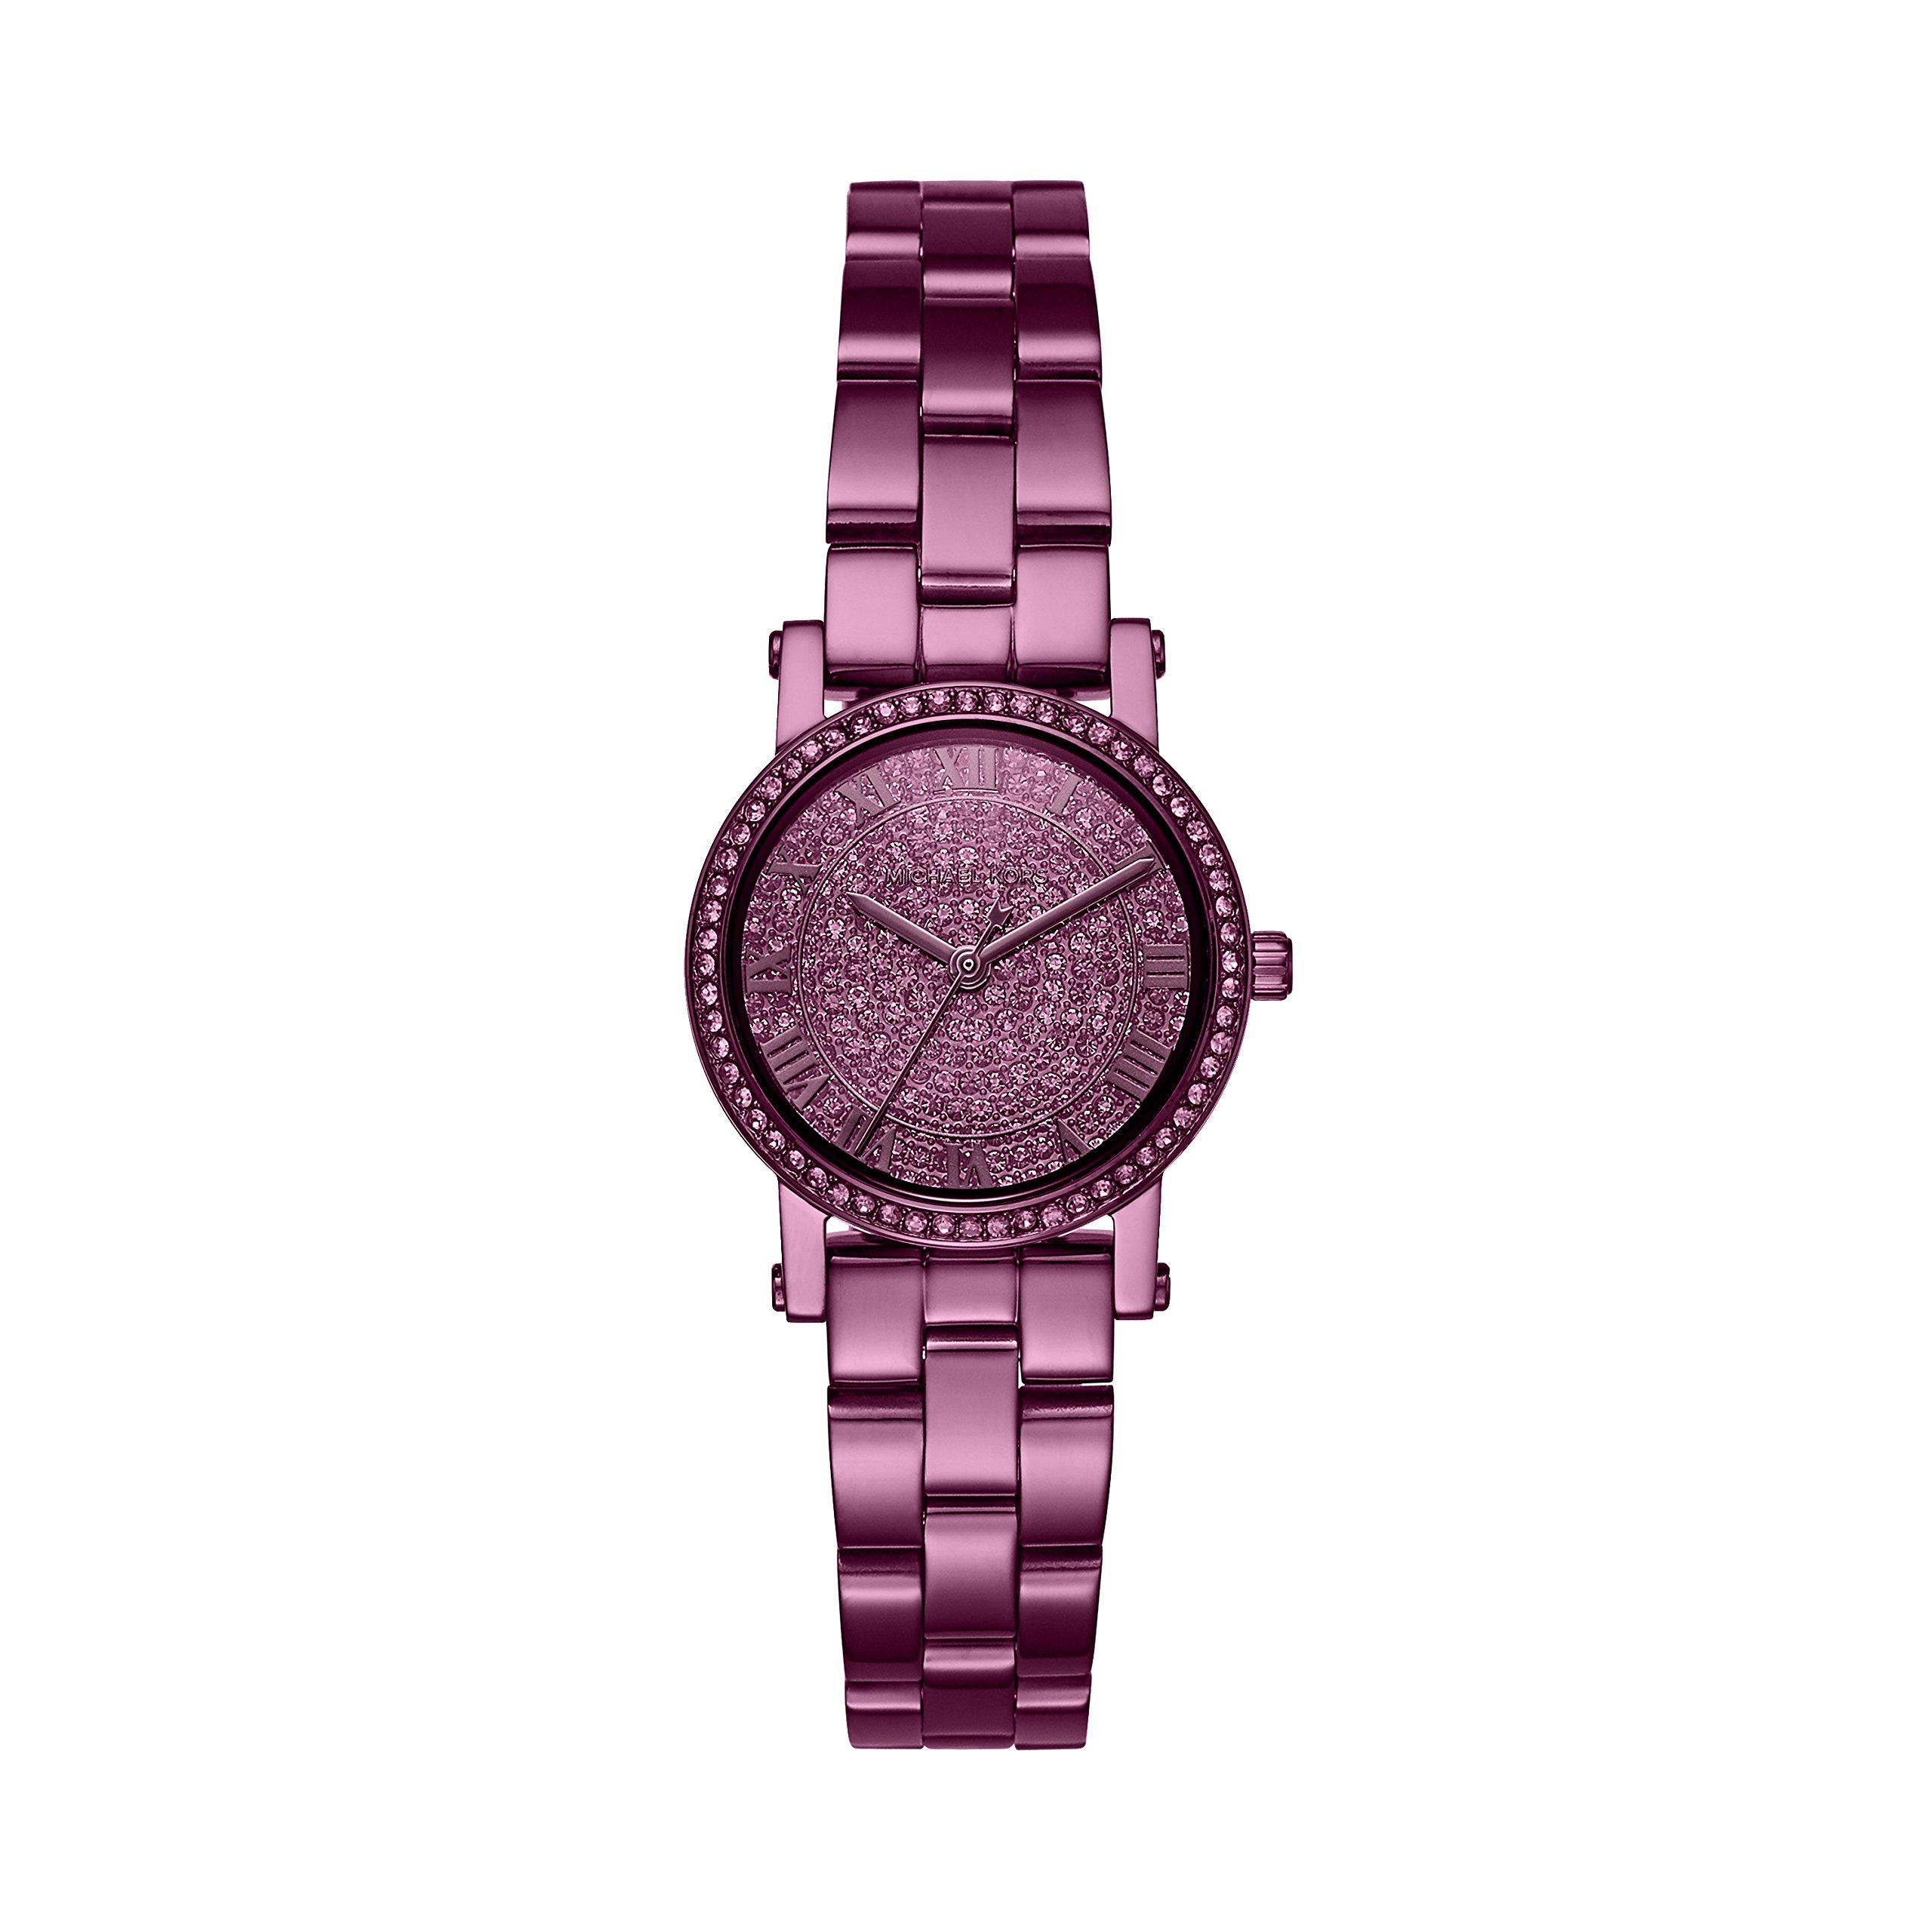 Michael Kors Women's 'Petite Norie' Quartz Stainless Steel Casual Watch, Color:Purple (Model: MK3778)